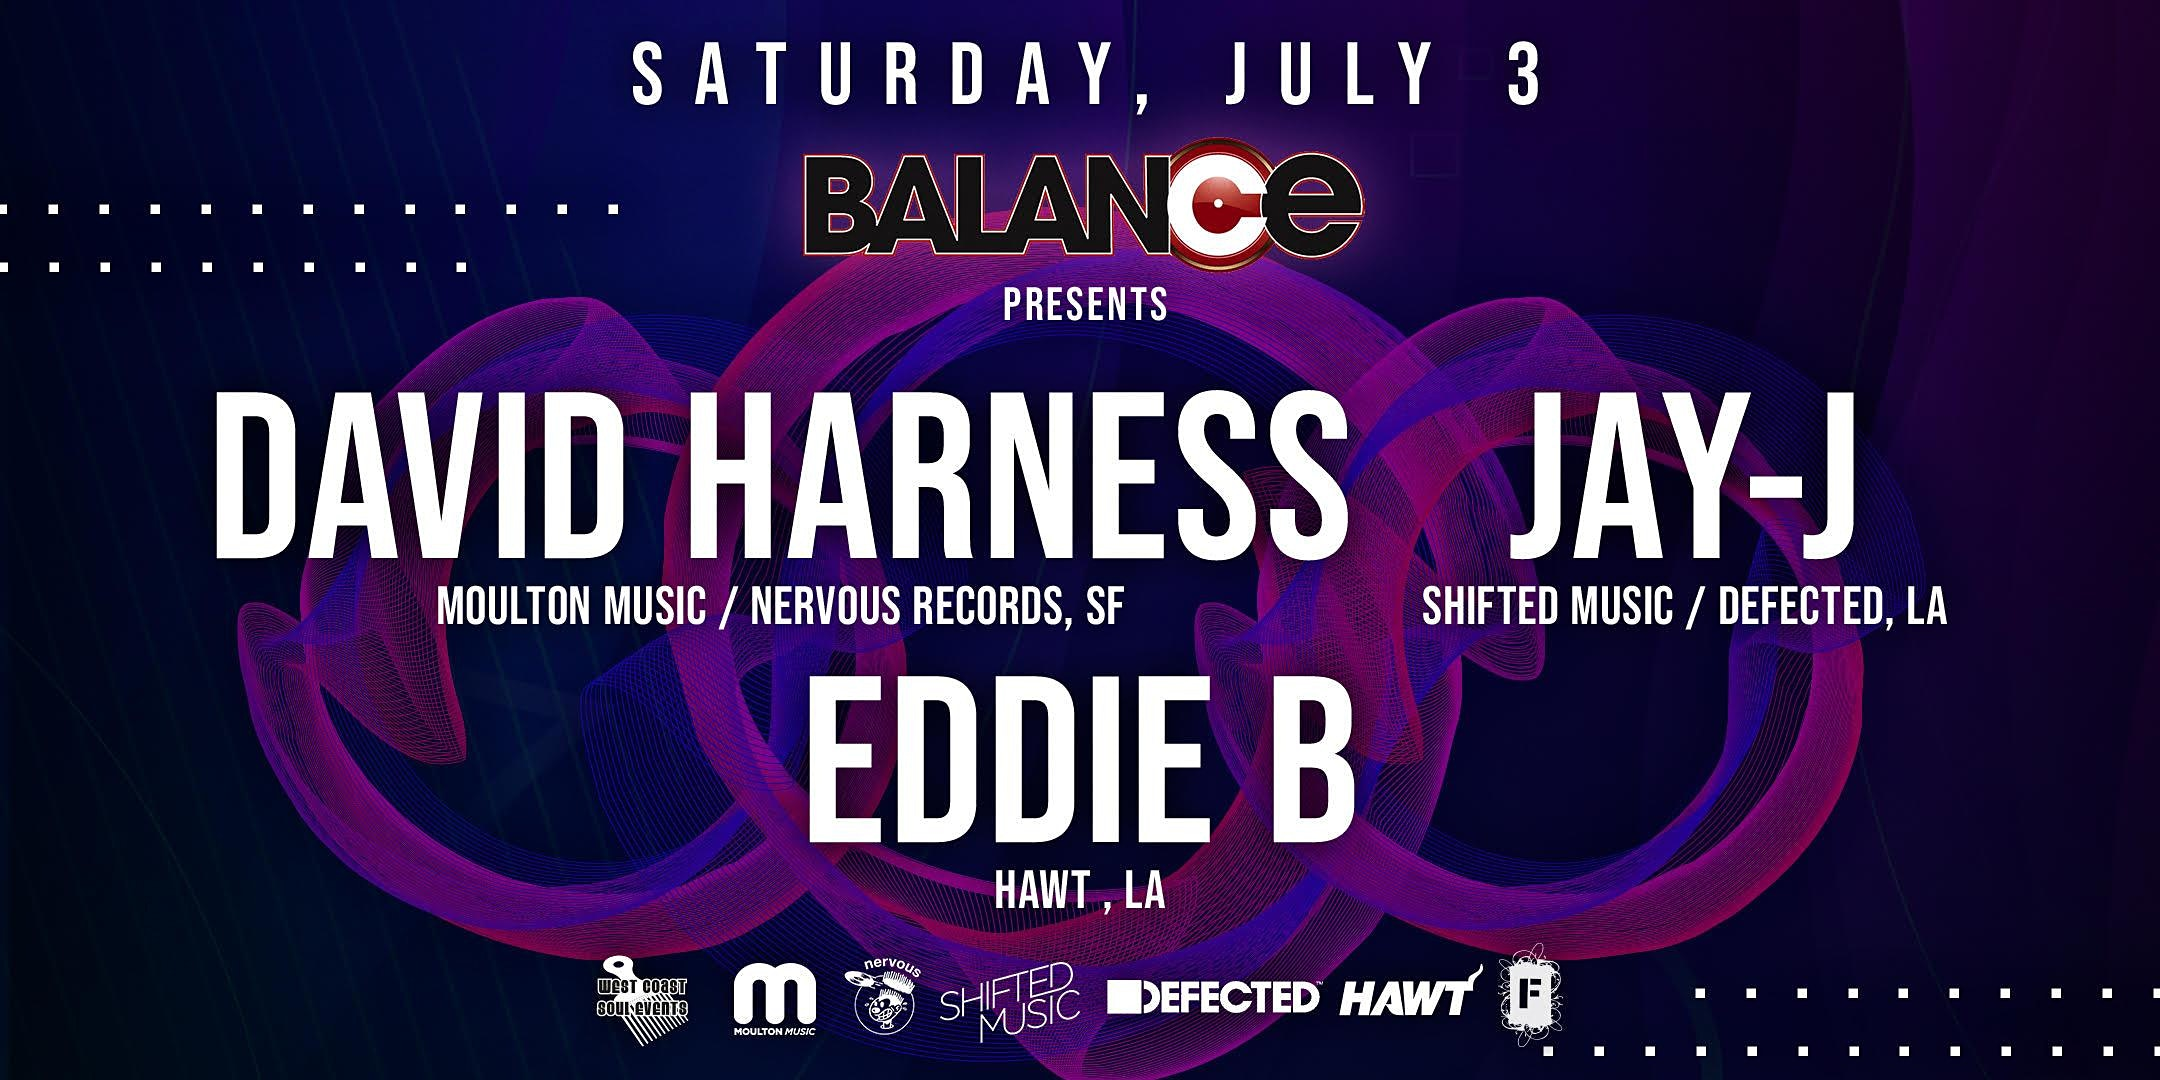 DAVID HARNESS (SF) & JAY-J (SF) Along with EDDIE B. (LA)